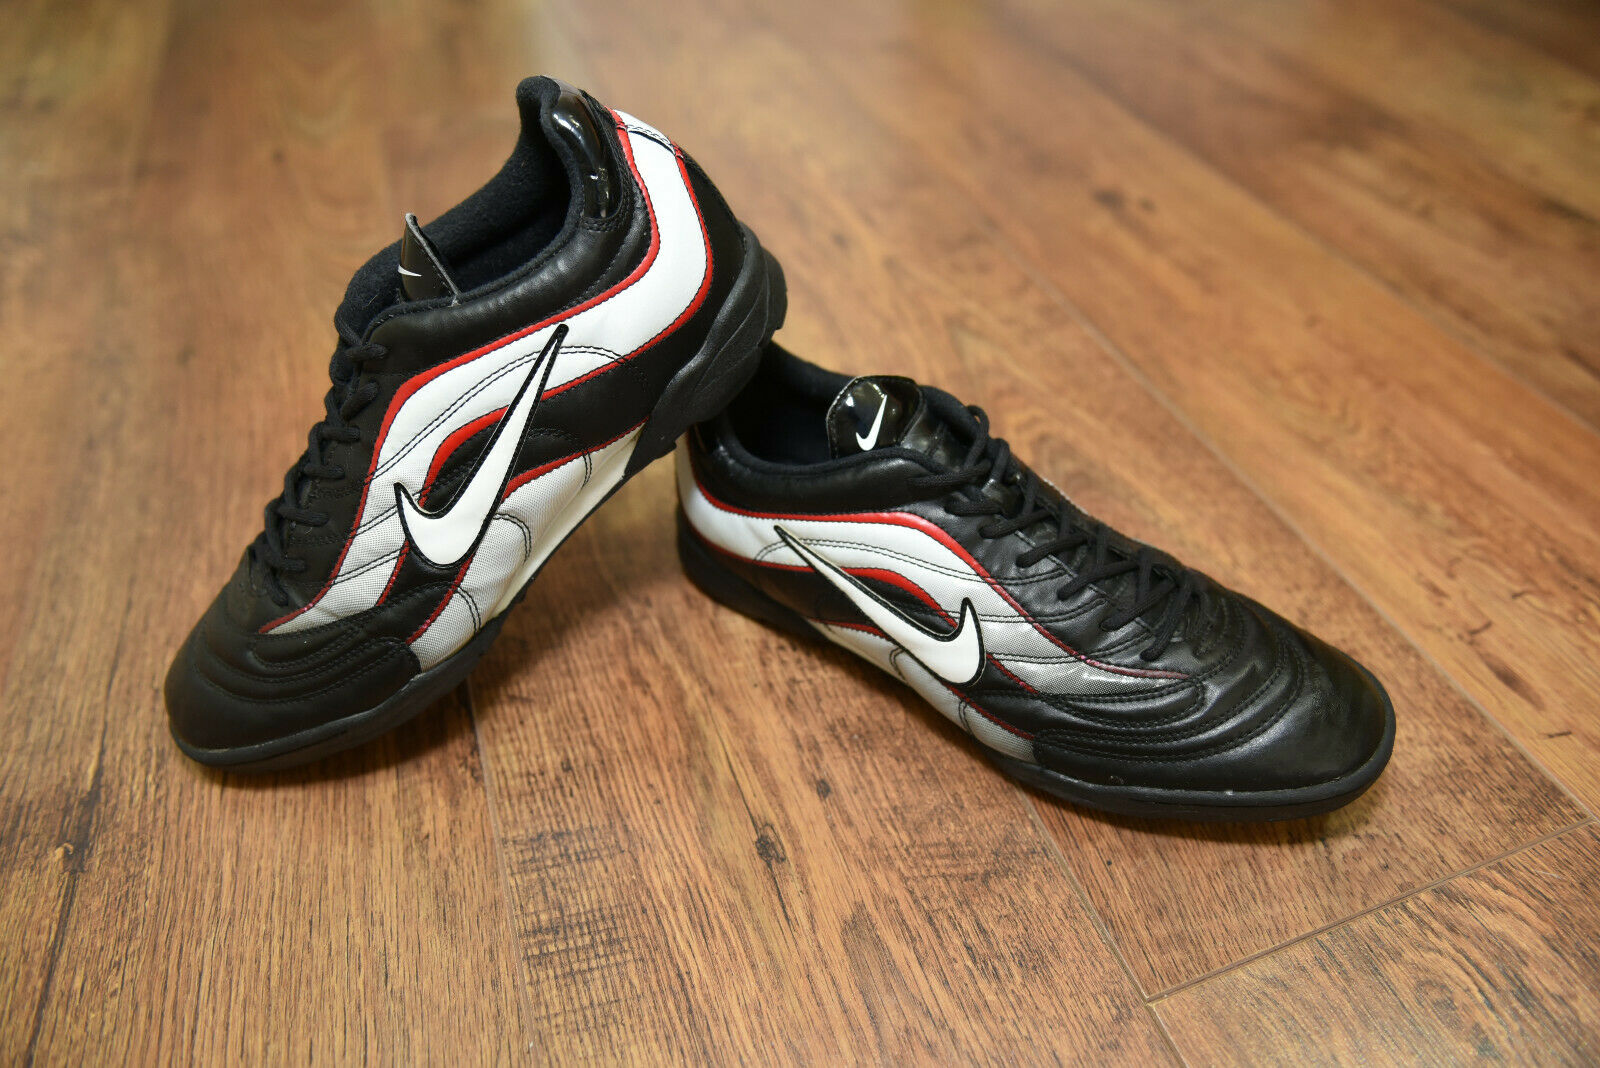 botas De Fútbol Nike Mercurial Ultracell AG R9 Astro Turf Uk 11 Zapatillas